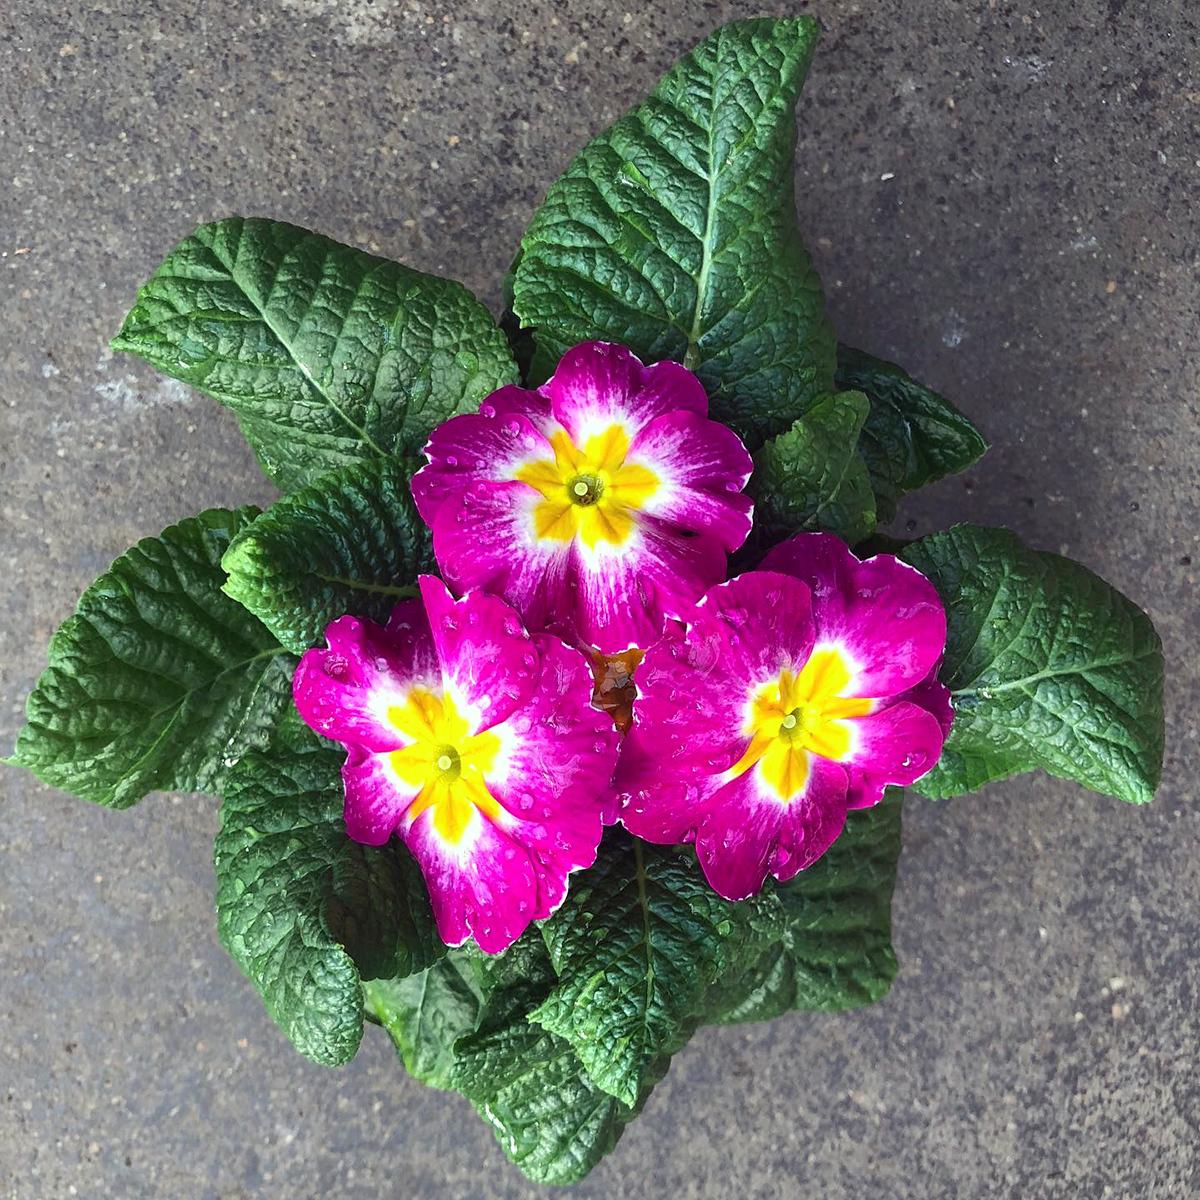 Primrose plant from Logan's